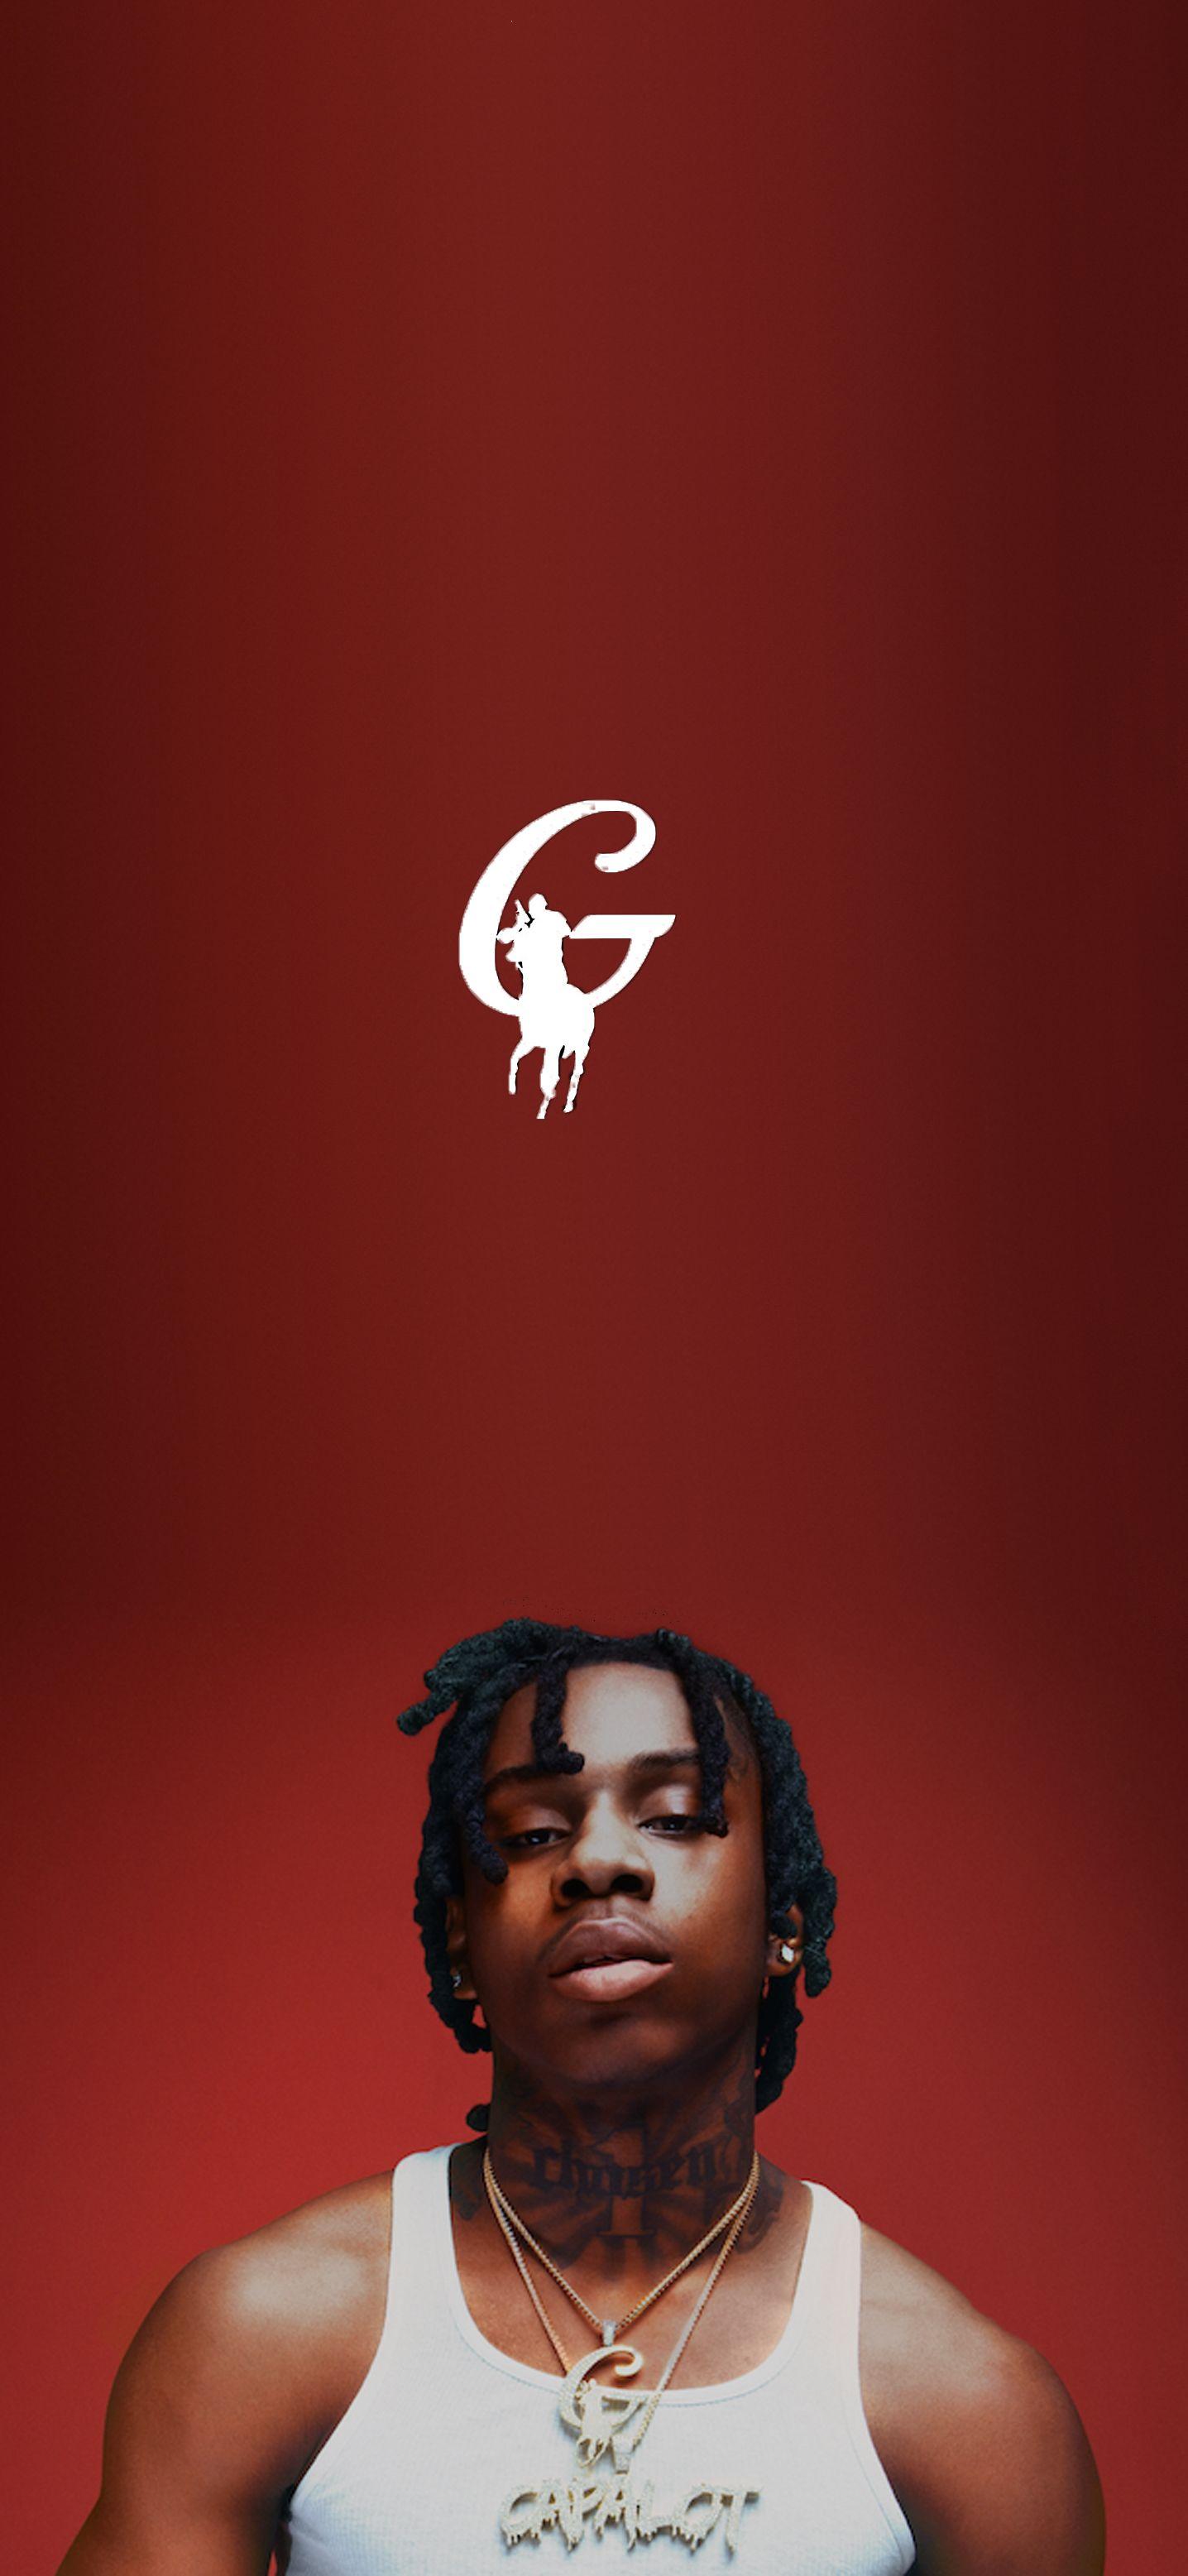 Polo G Wallpaper In 2020 Rapper Wallpaper Iphone Iphone Wallpaper Tumblr Aesthetic Rap Wallpaper